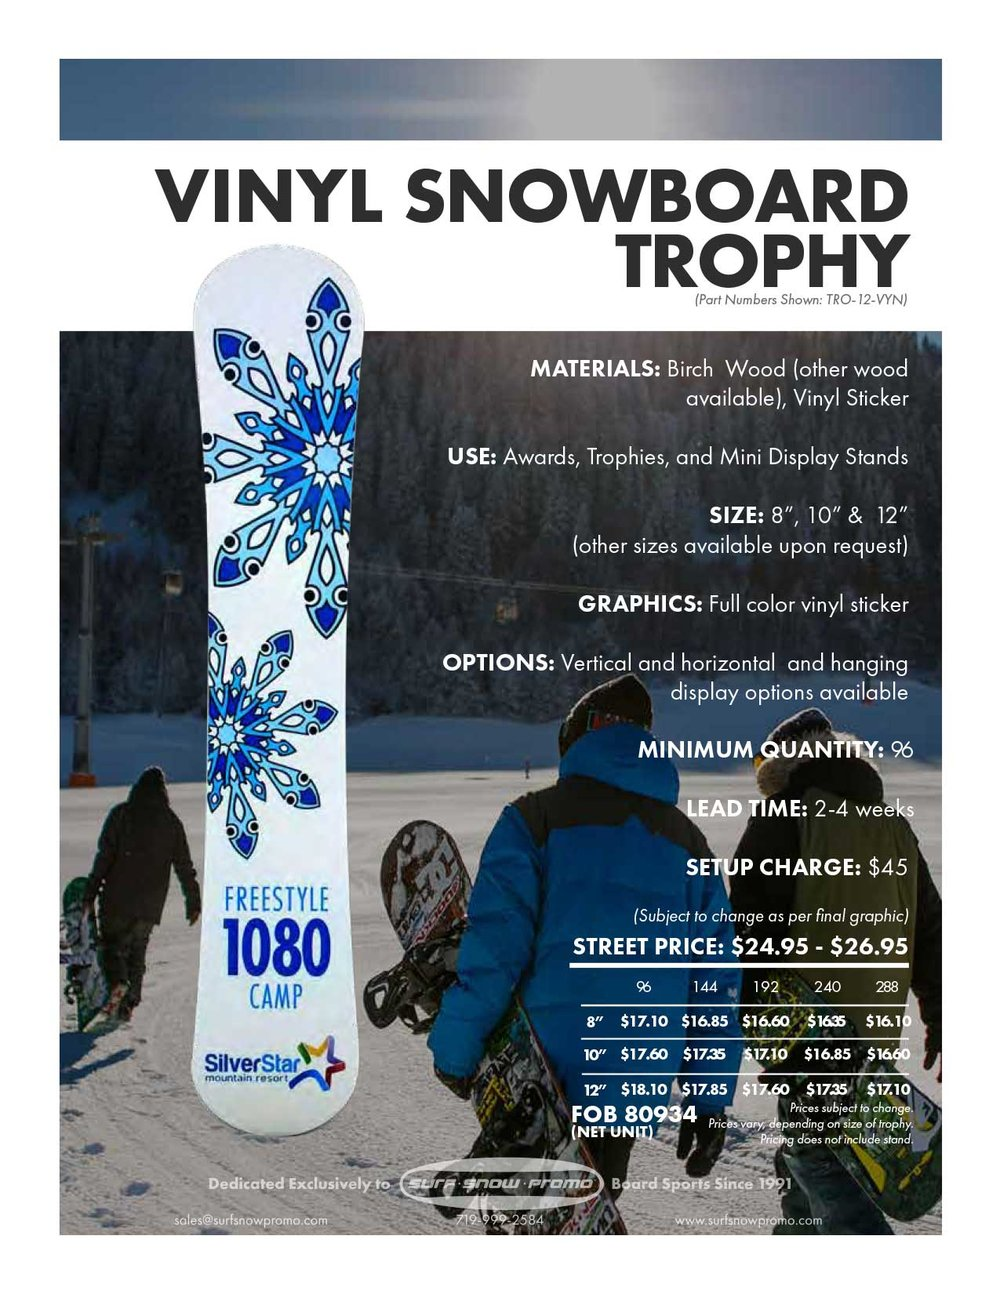 vinyl_snowboard_trophy_sell_sheet_fnl.jpg